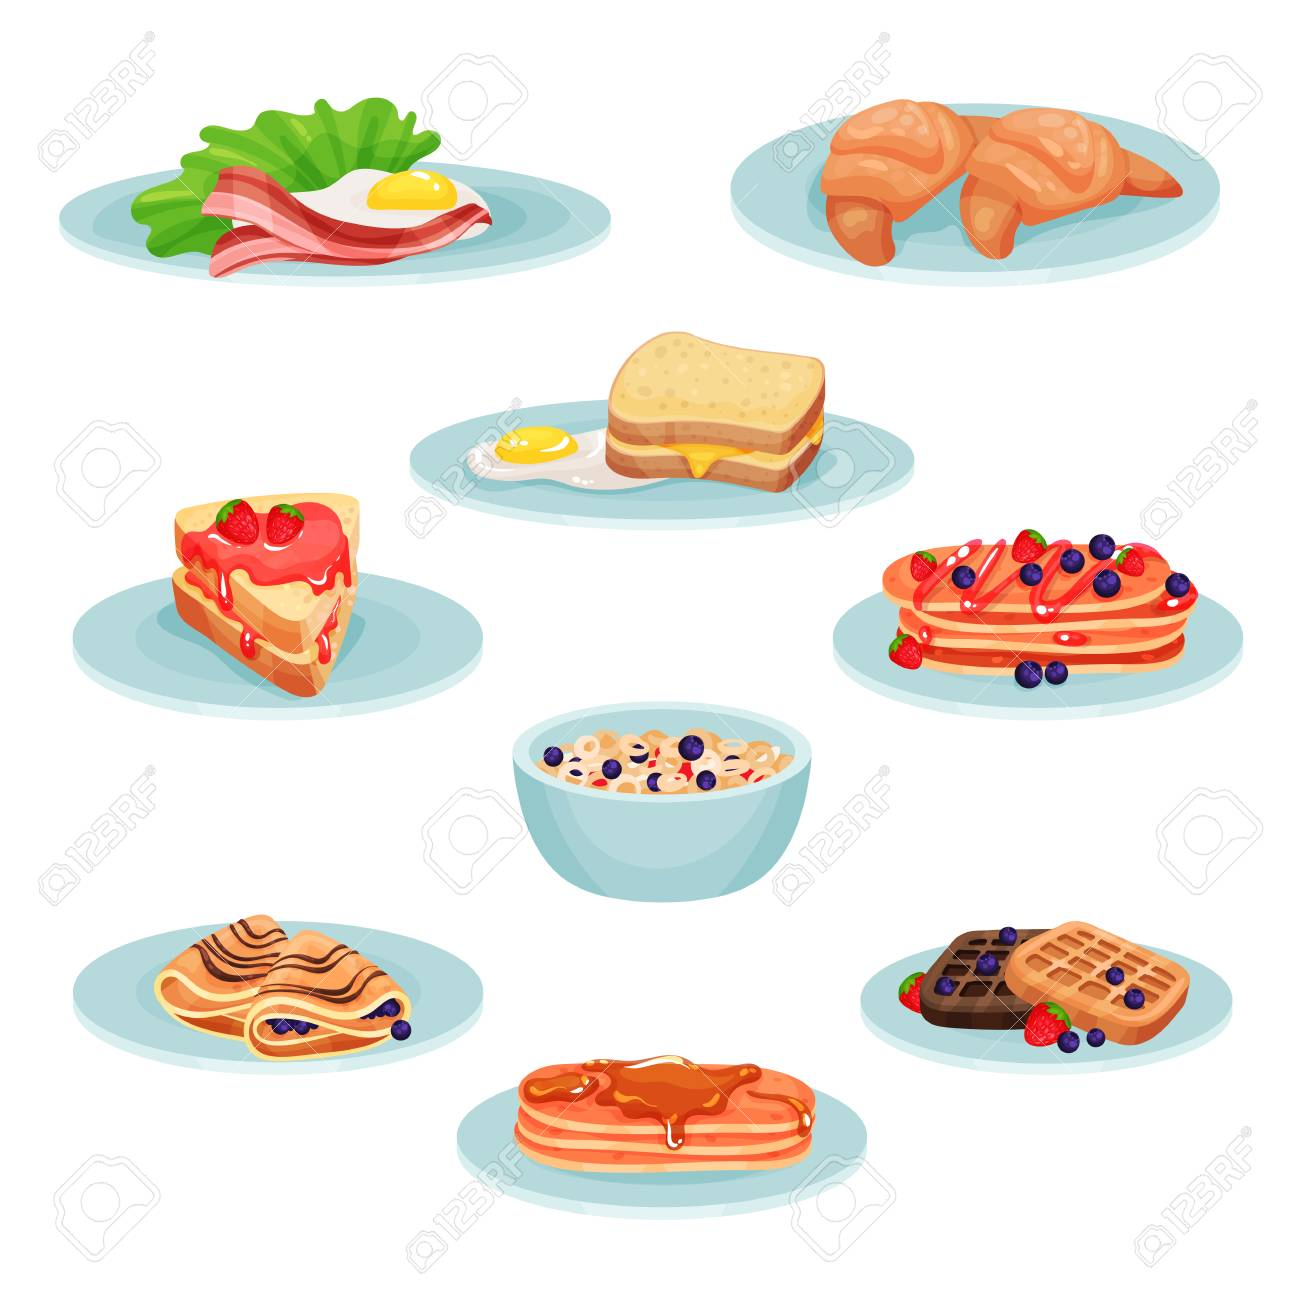 Breakfast menu food set, acon, fried eggs, croissant, sandwich, pancakes, muesli, wafers Illustration isolated on a white background. - 97590132